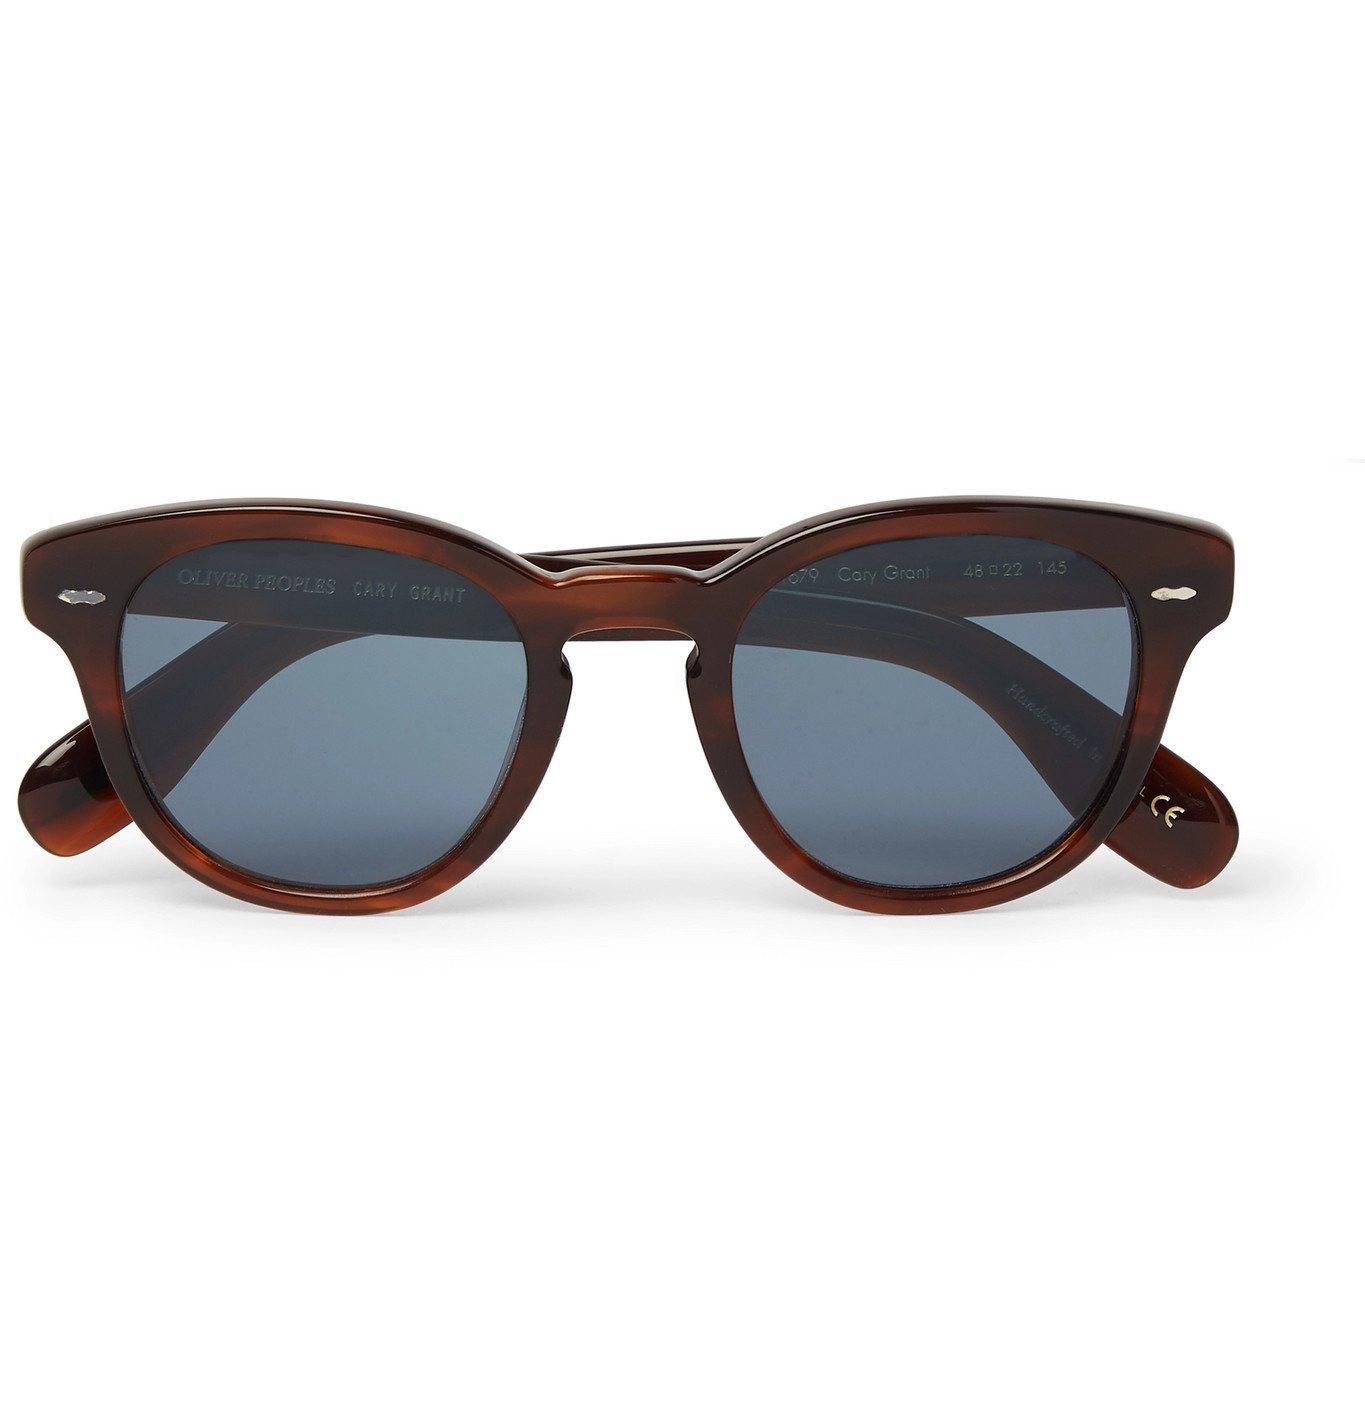 Oliver Peoples - Cary Grant Round-Frame Tortoiseshell Acetate Sunglasses - Tortoiseshell